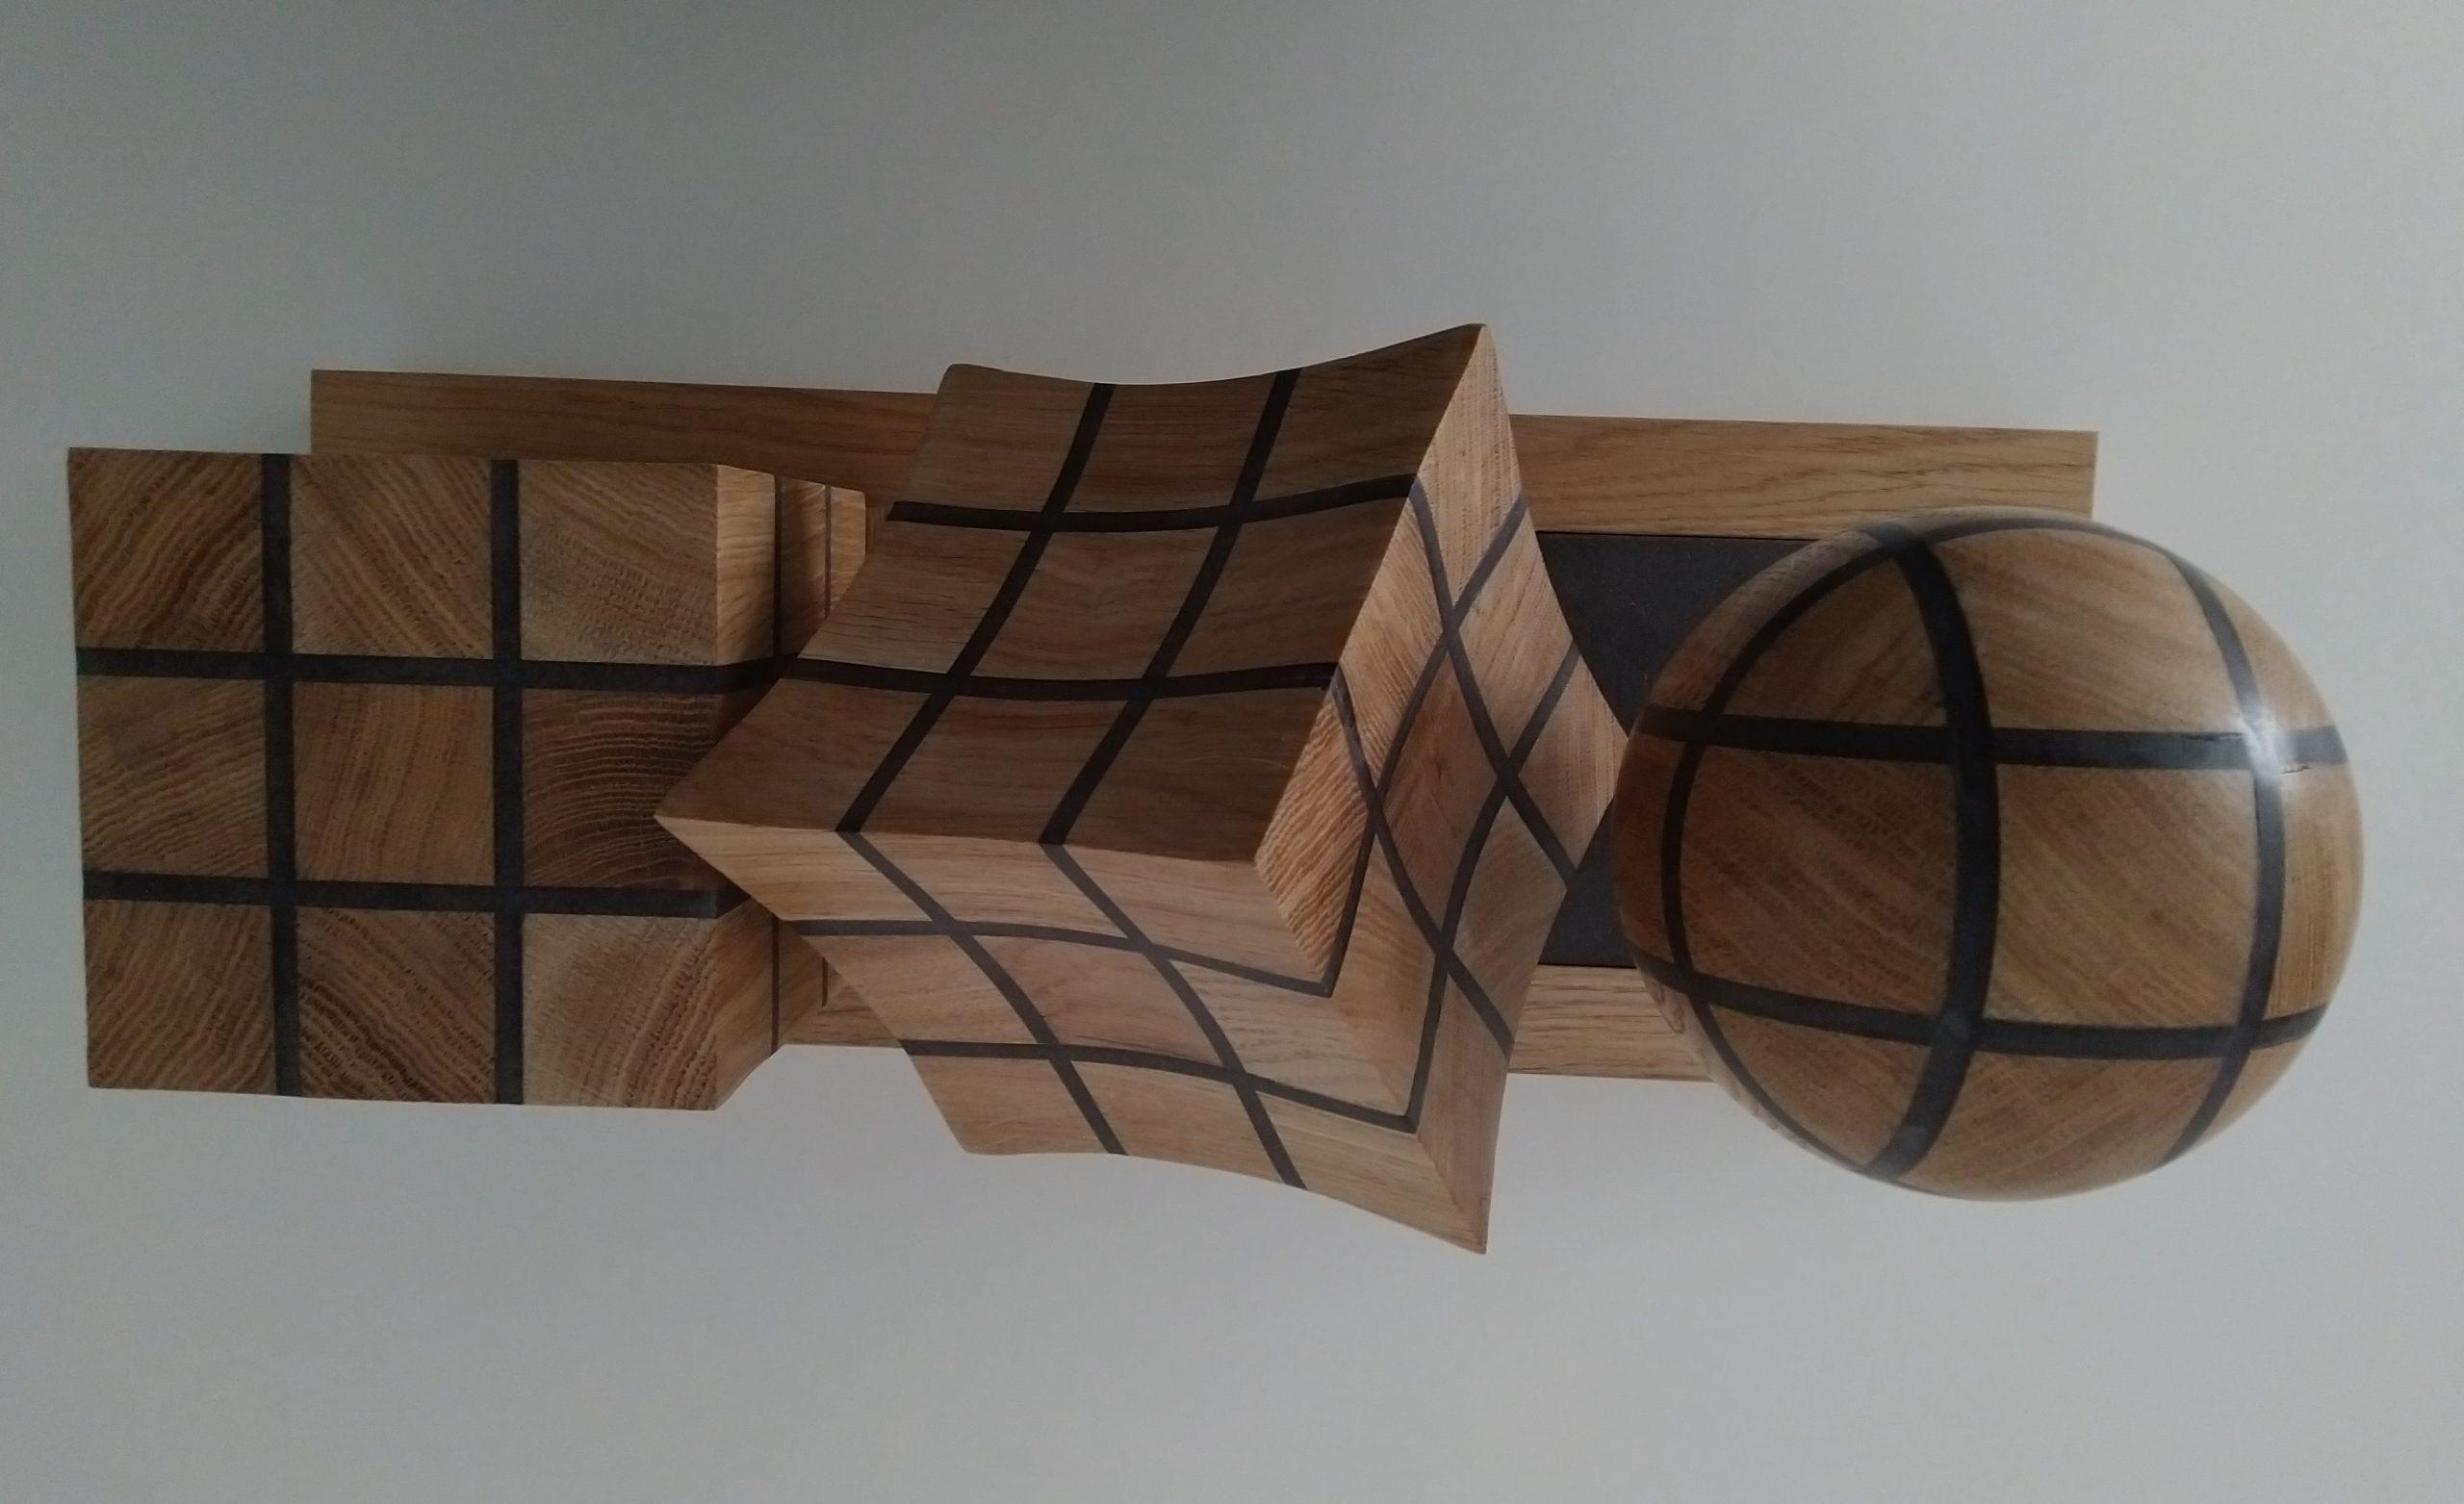 Métamorphose du cube